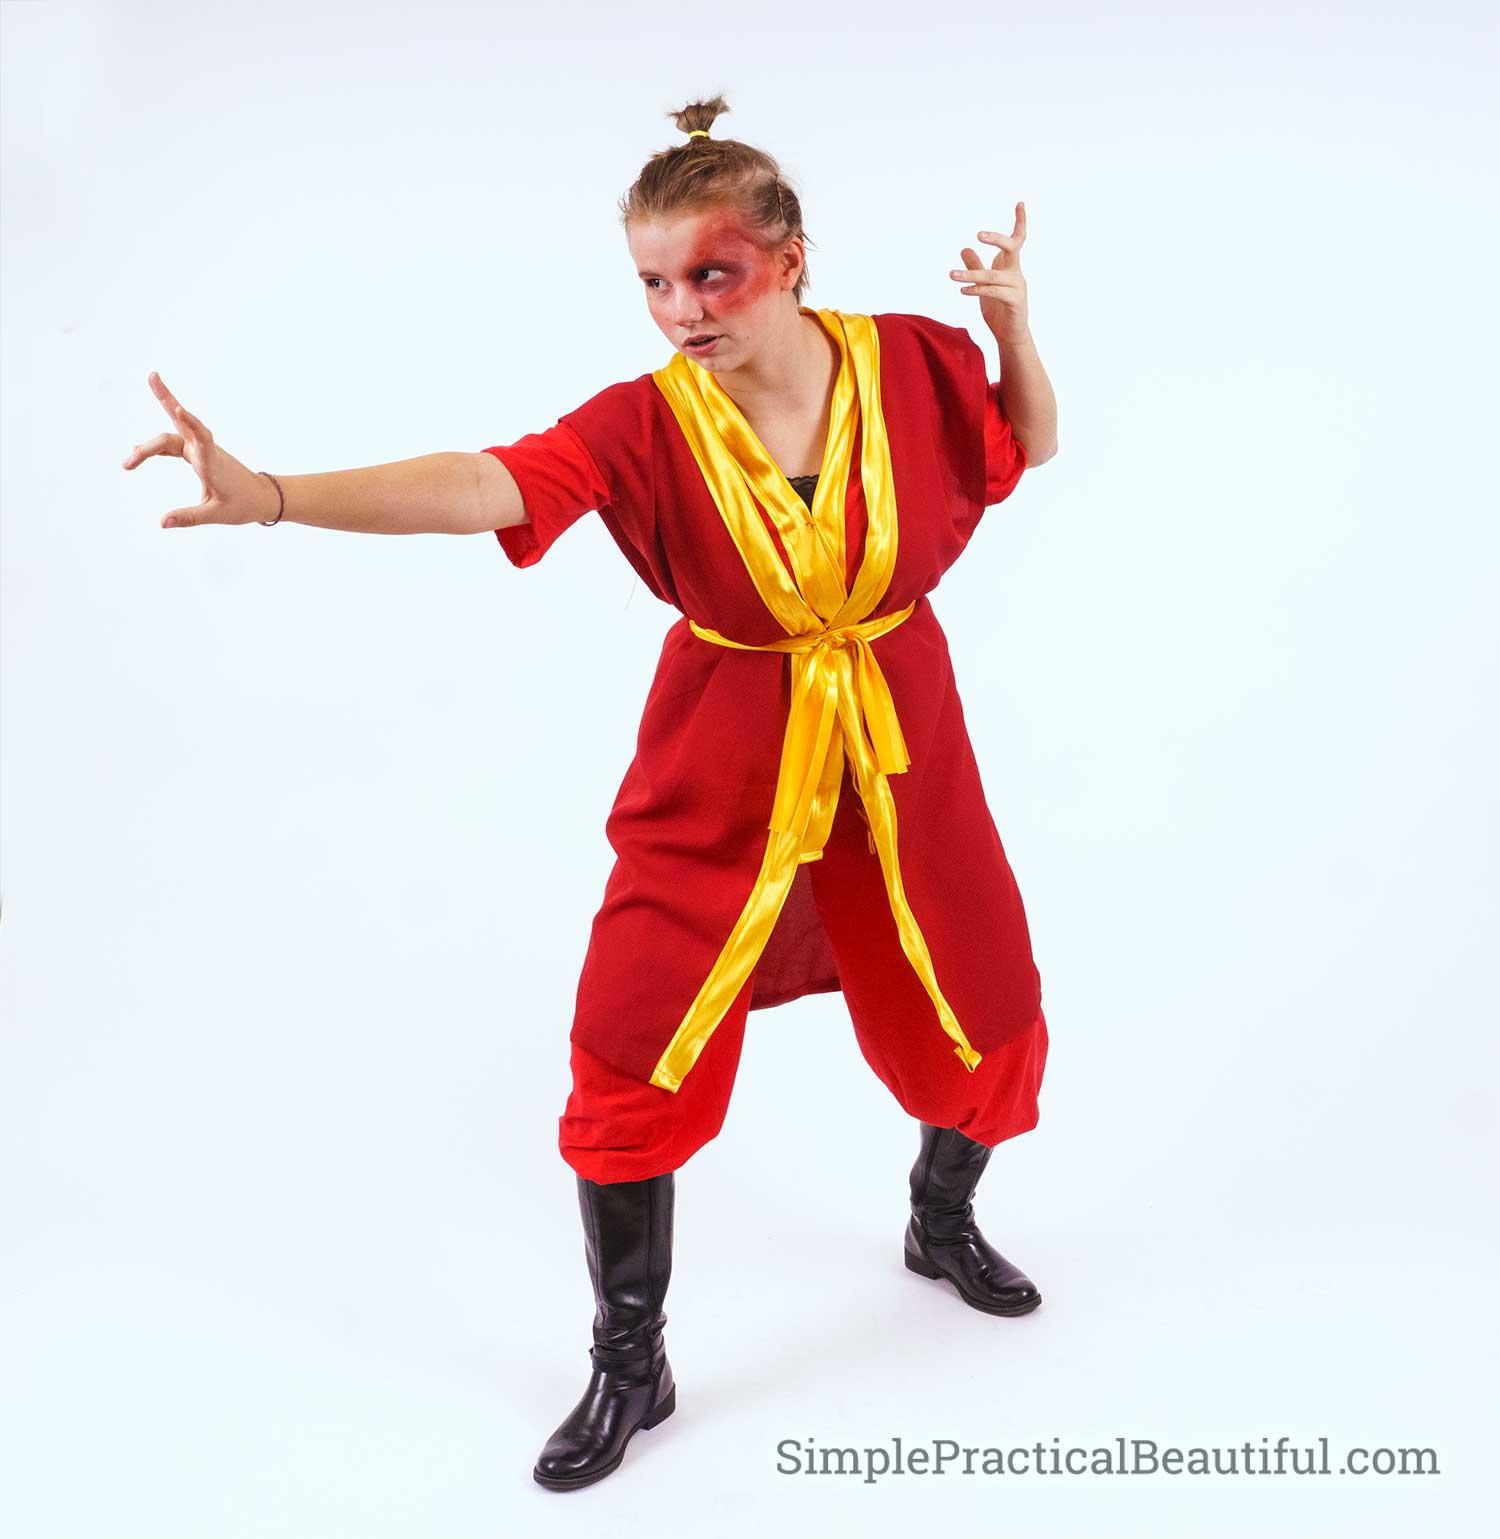 Zuko the Firebender Costume